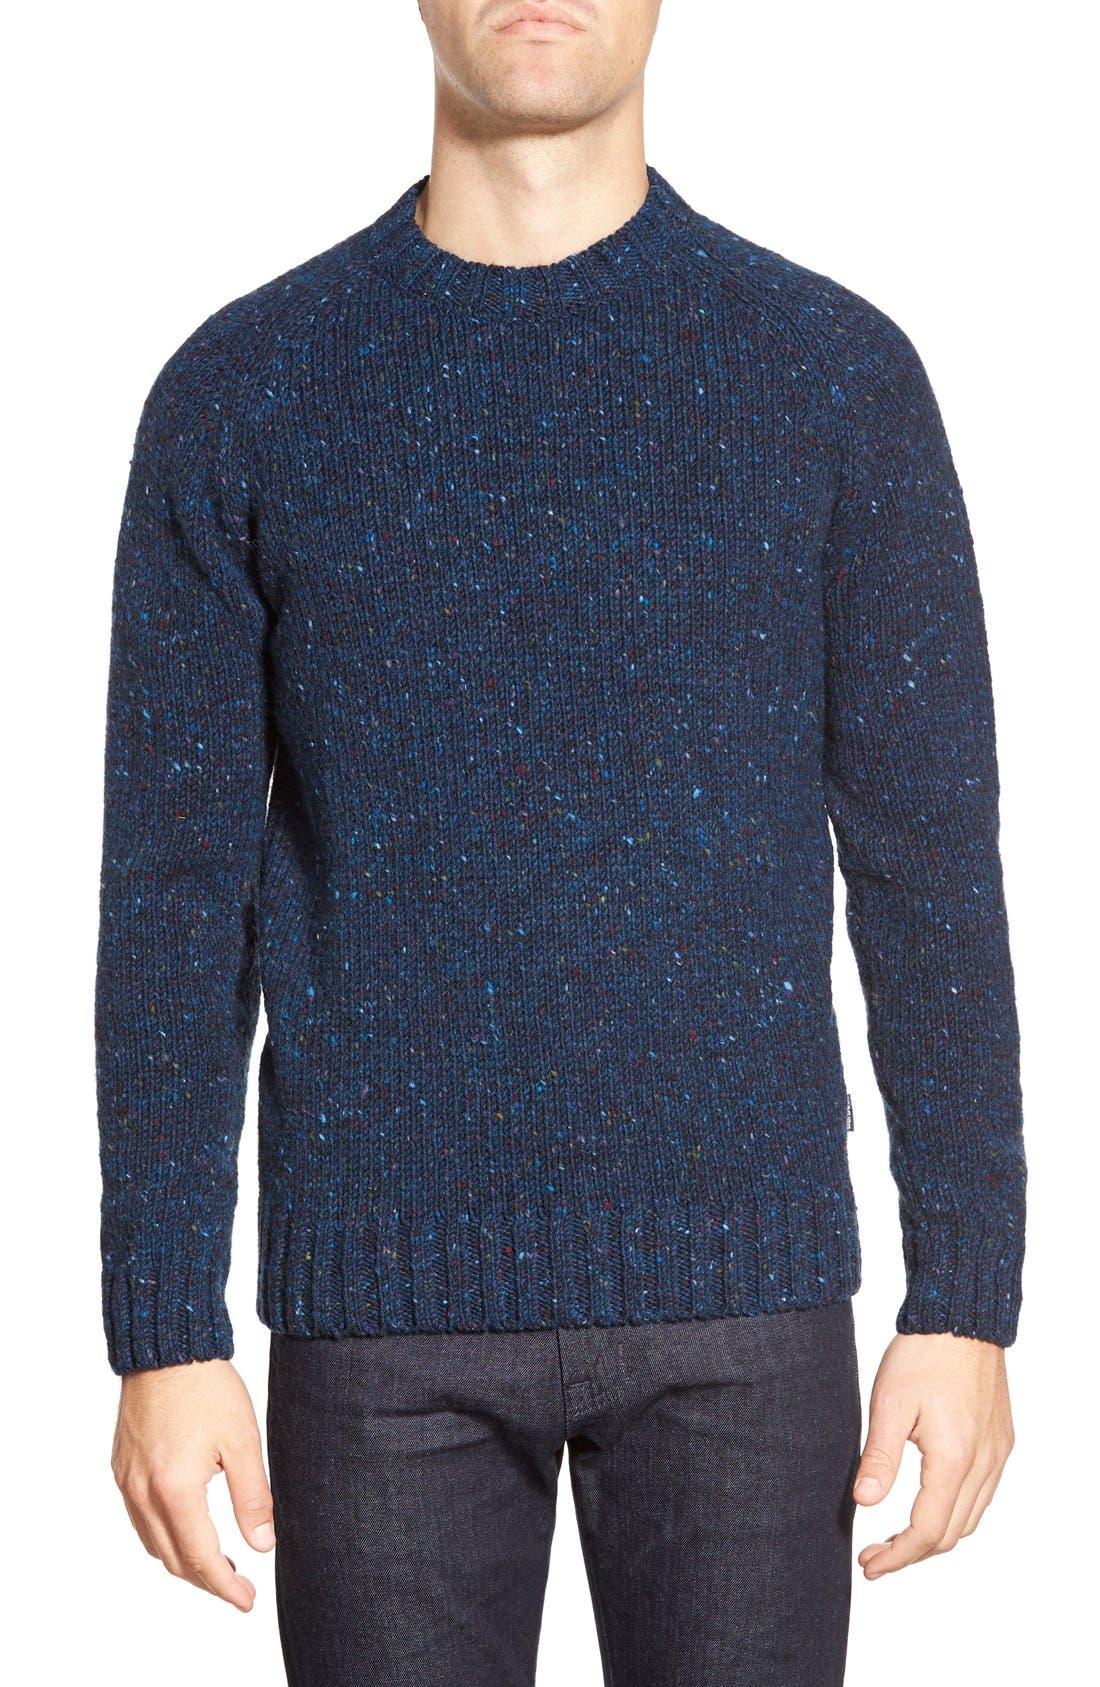 'Netherby' Kilcara Tweed Crewneck Sweater, Main, color, 400